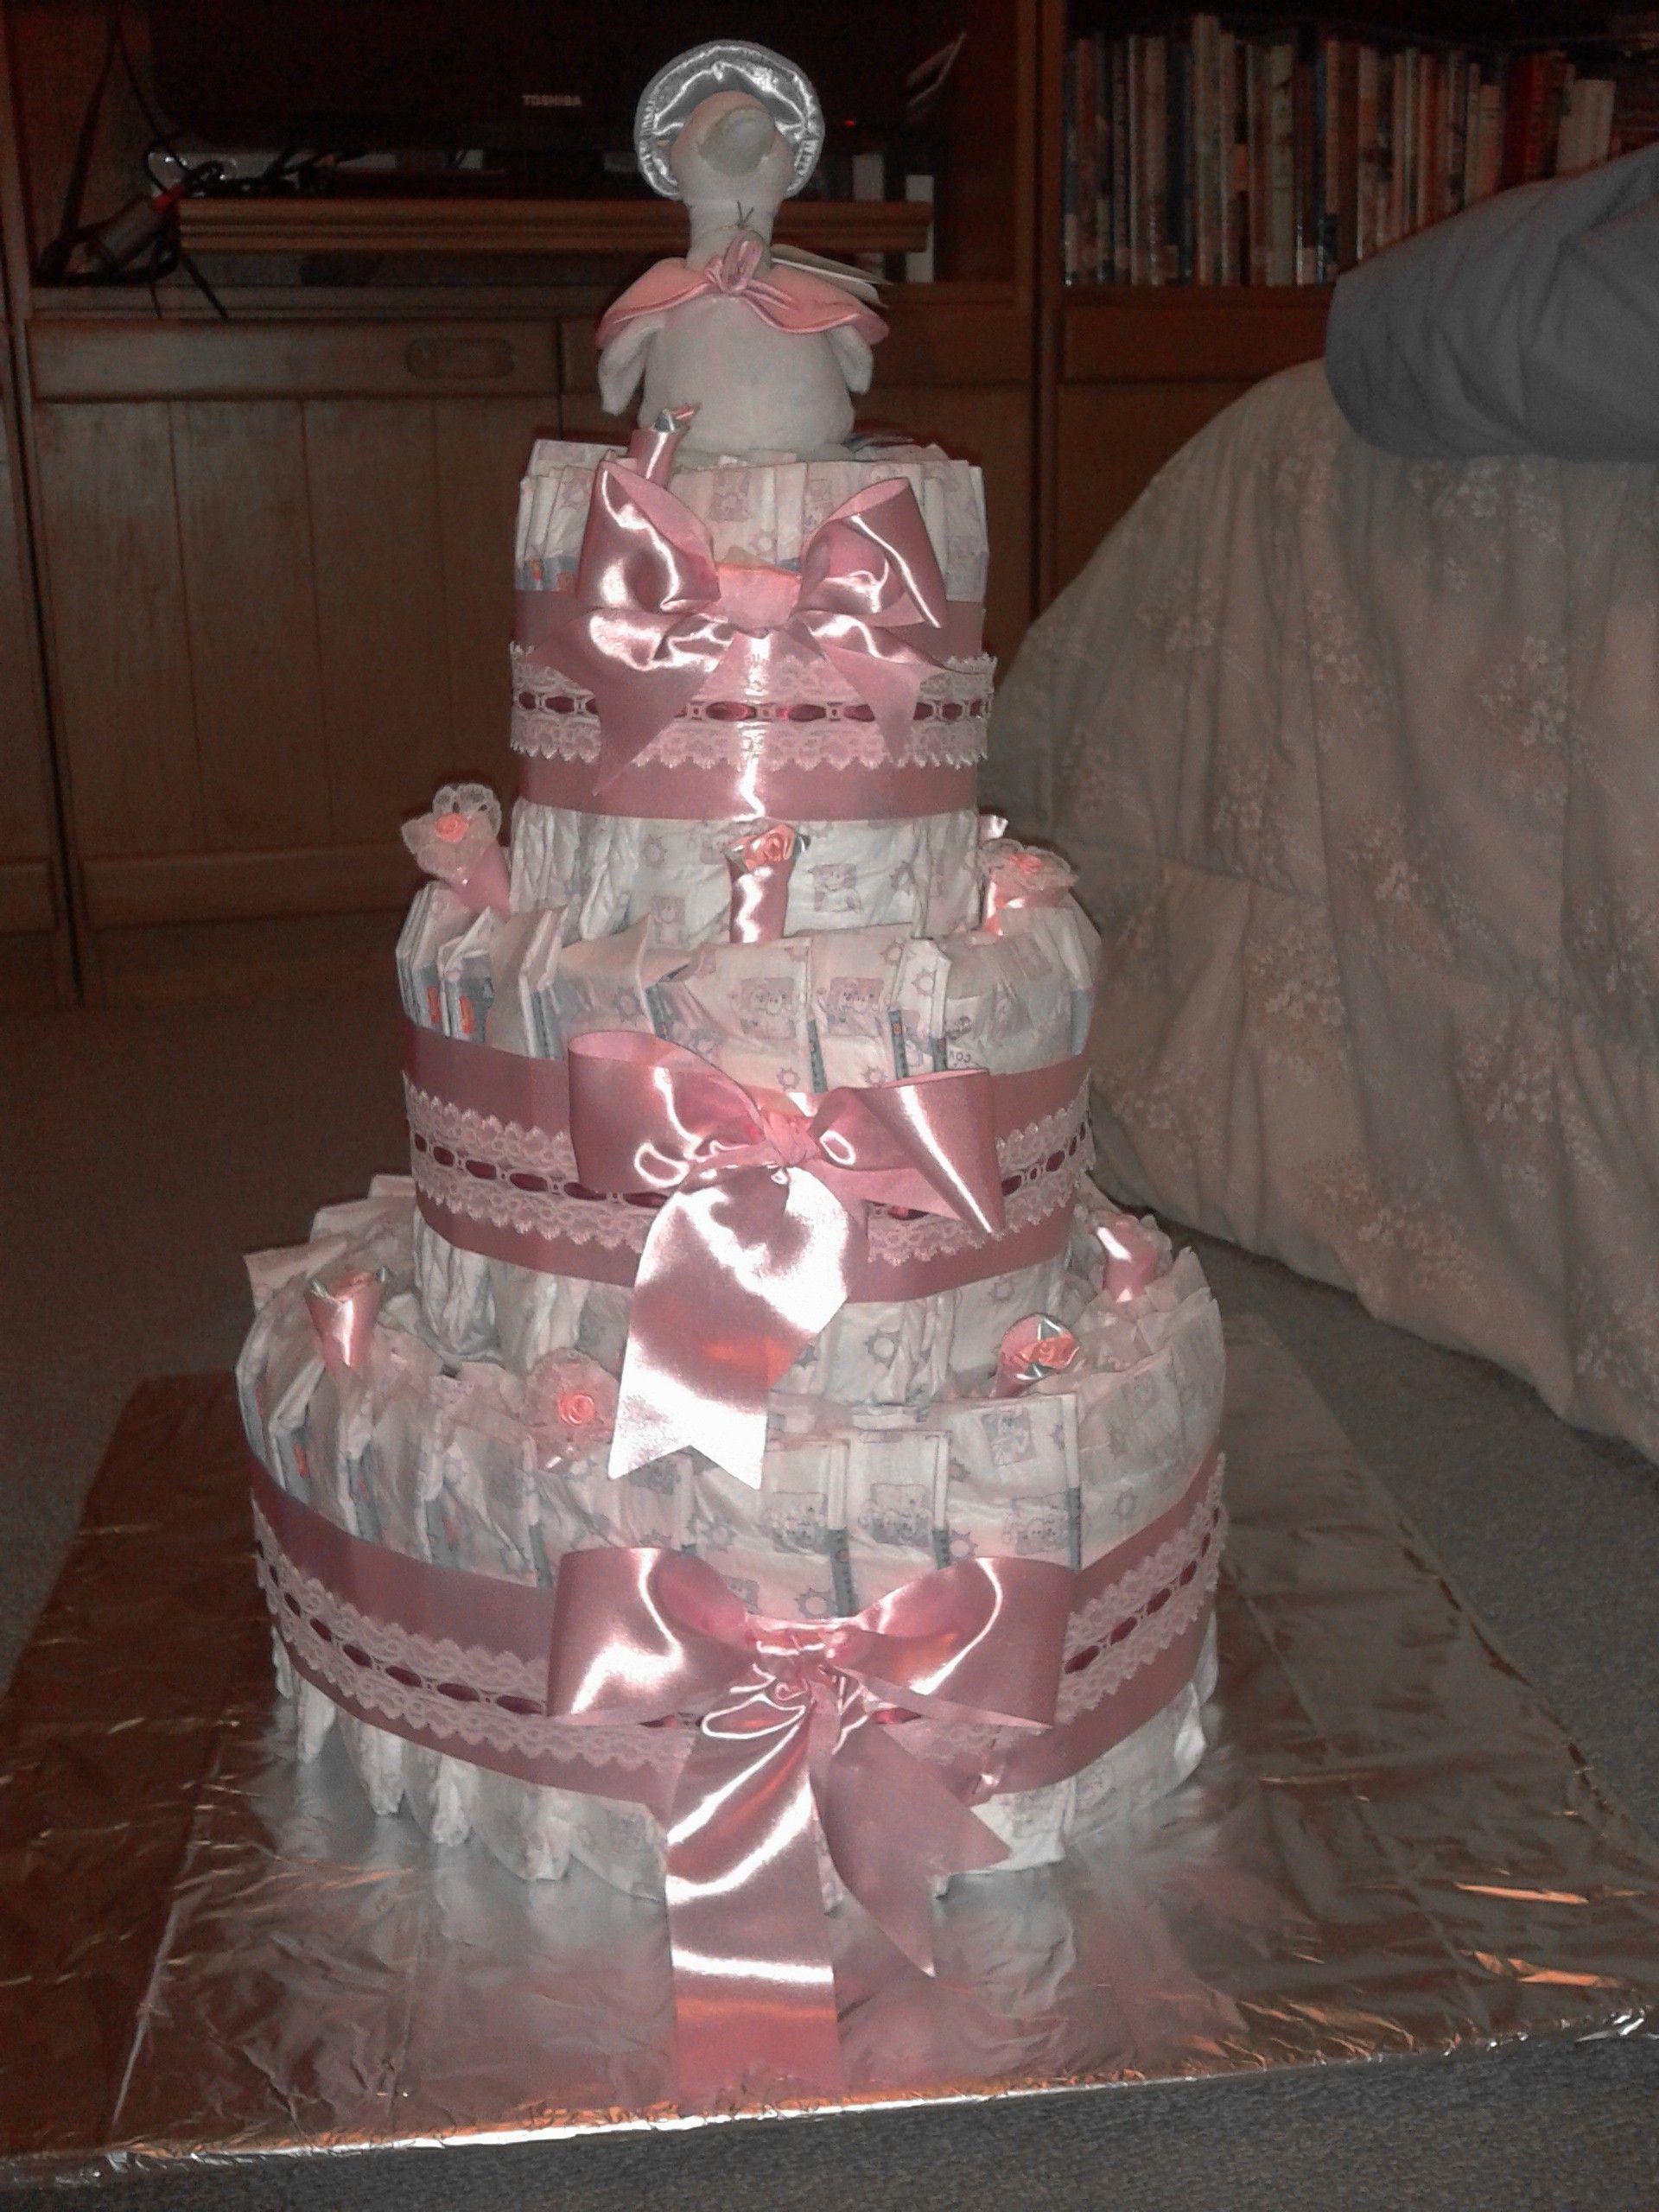 Nappy Cake!